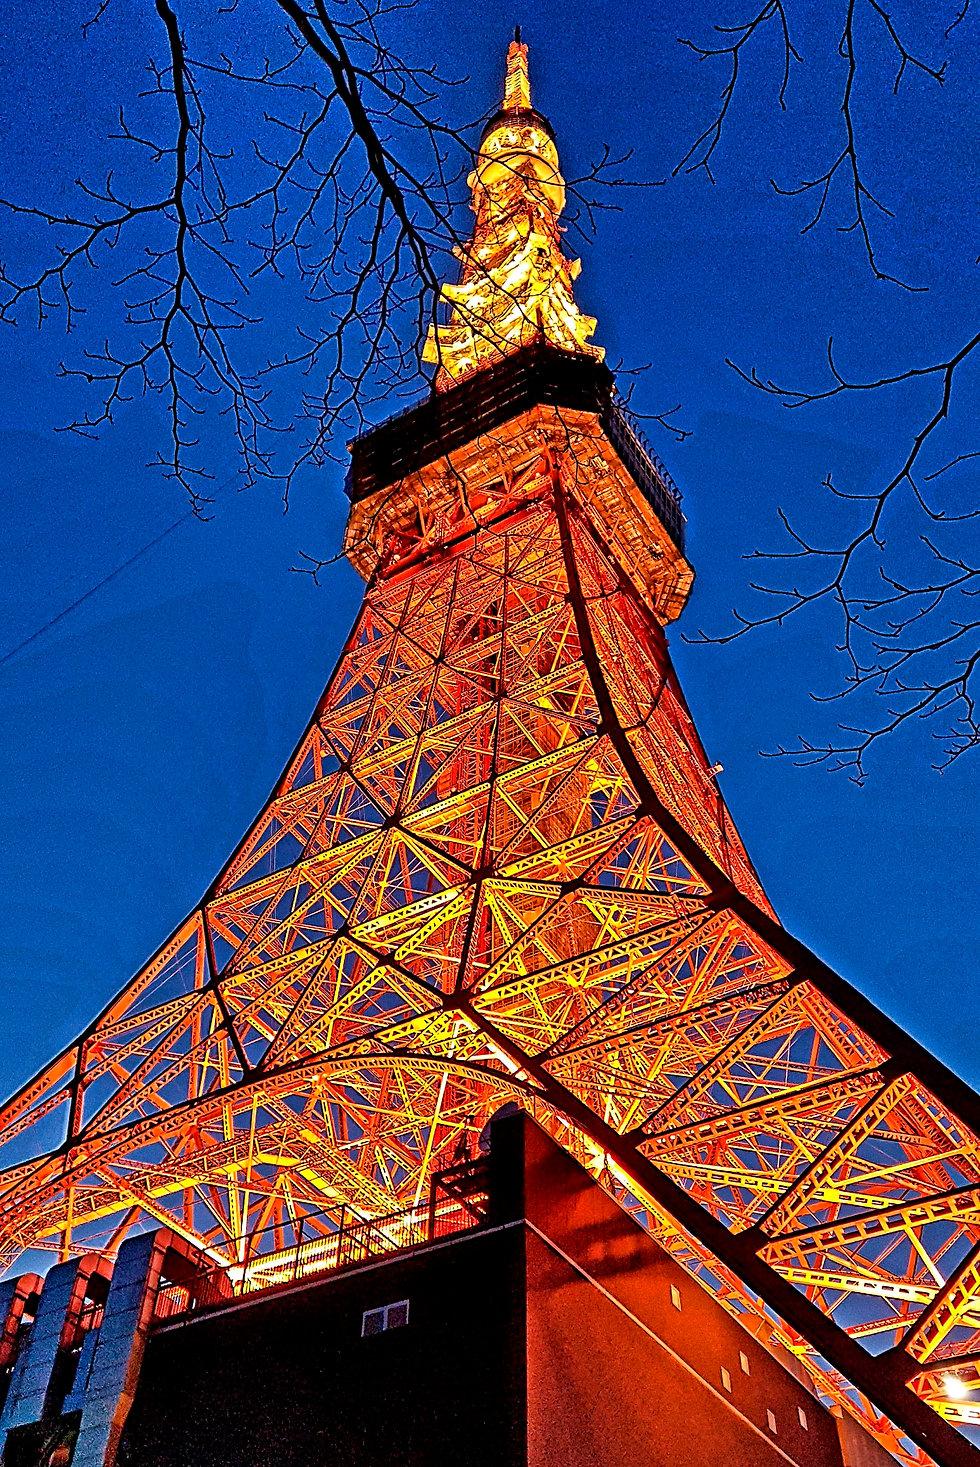 torre tokio, tokyo tower